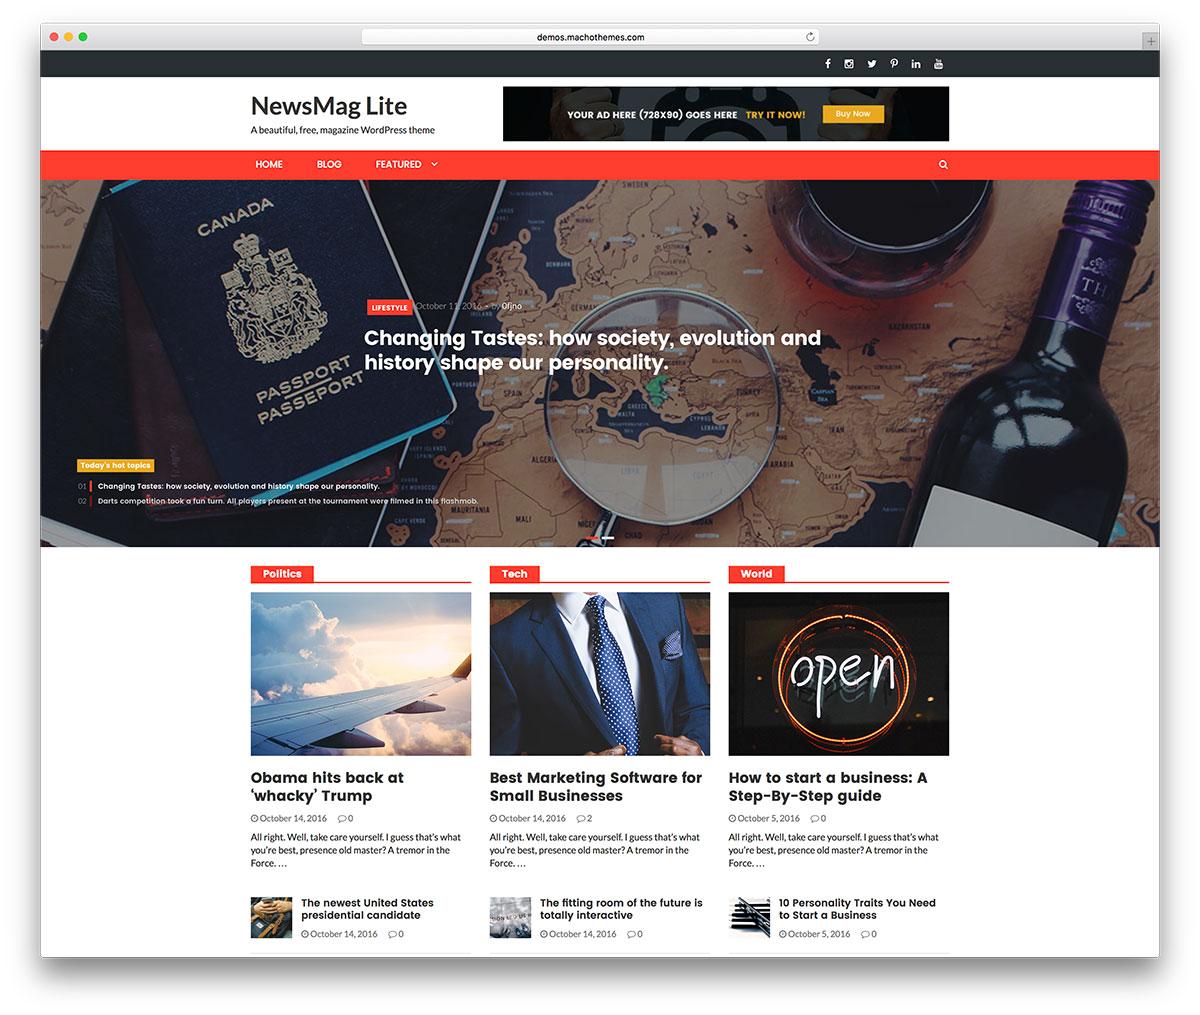 newsmaglite-free-magazine-wordpress-theme